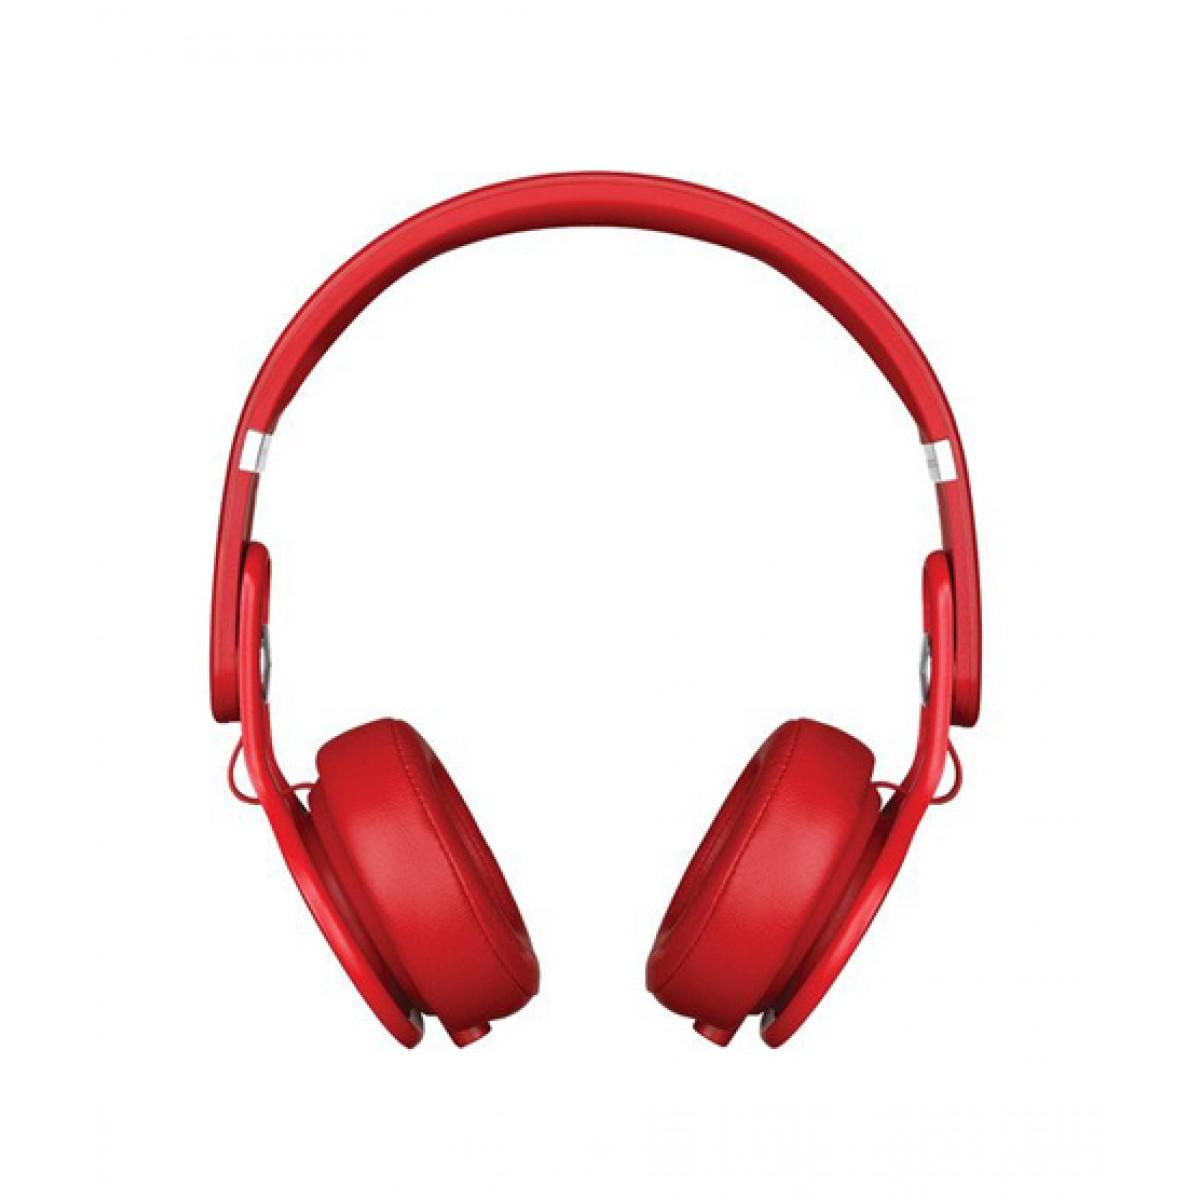 a163b837537 Beats Mixr Headphone Price in Pakistan | Buy Beats Mixr On-Ear Headphone  Red | iShopping.pk